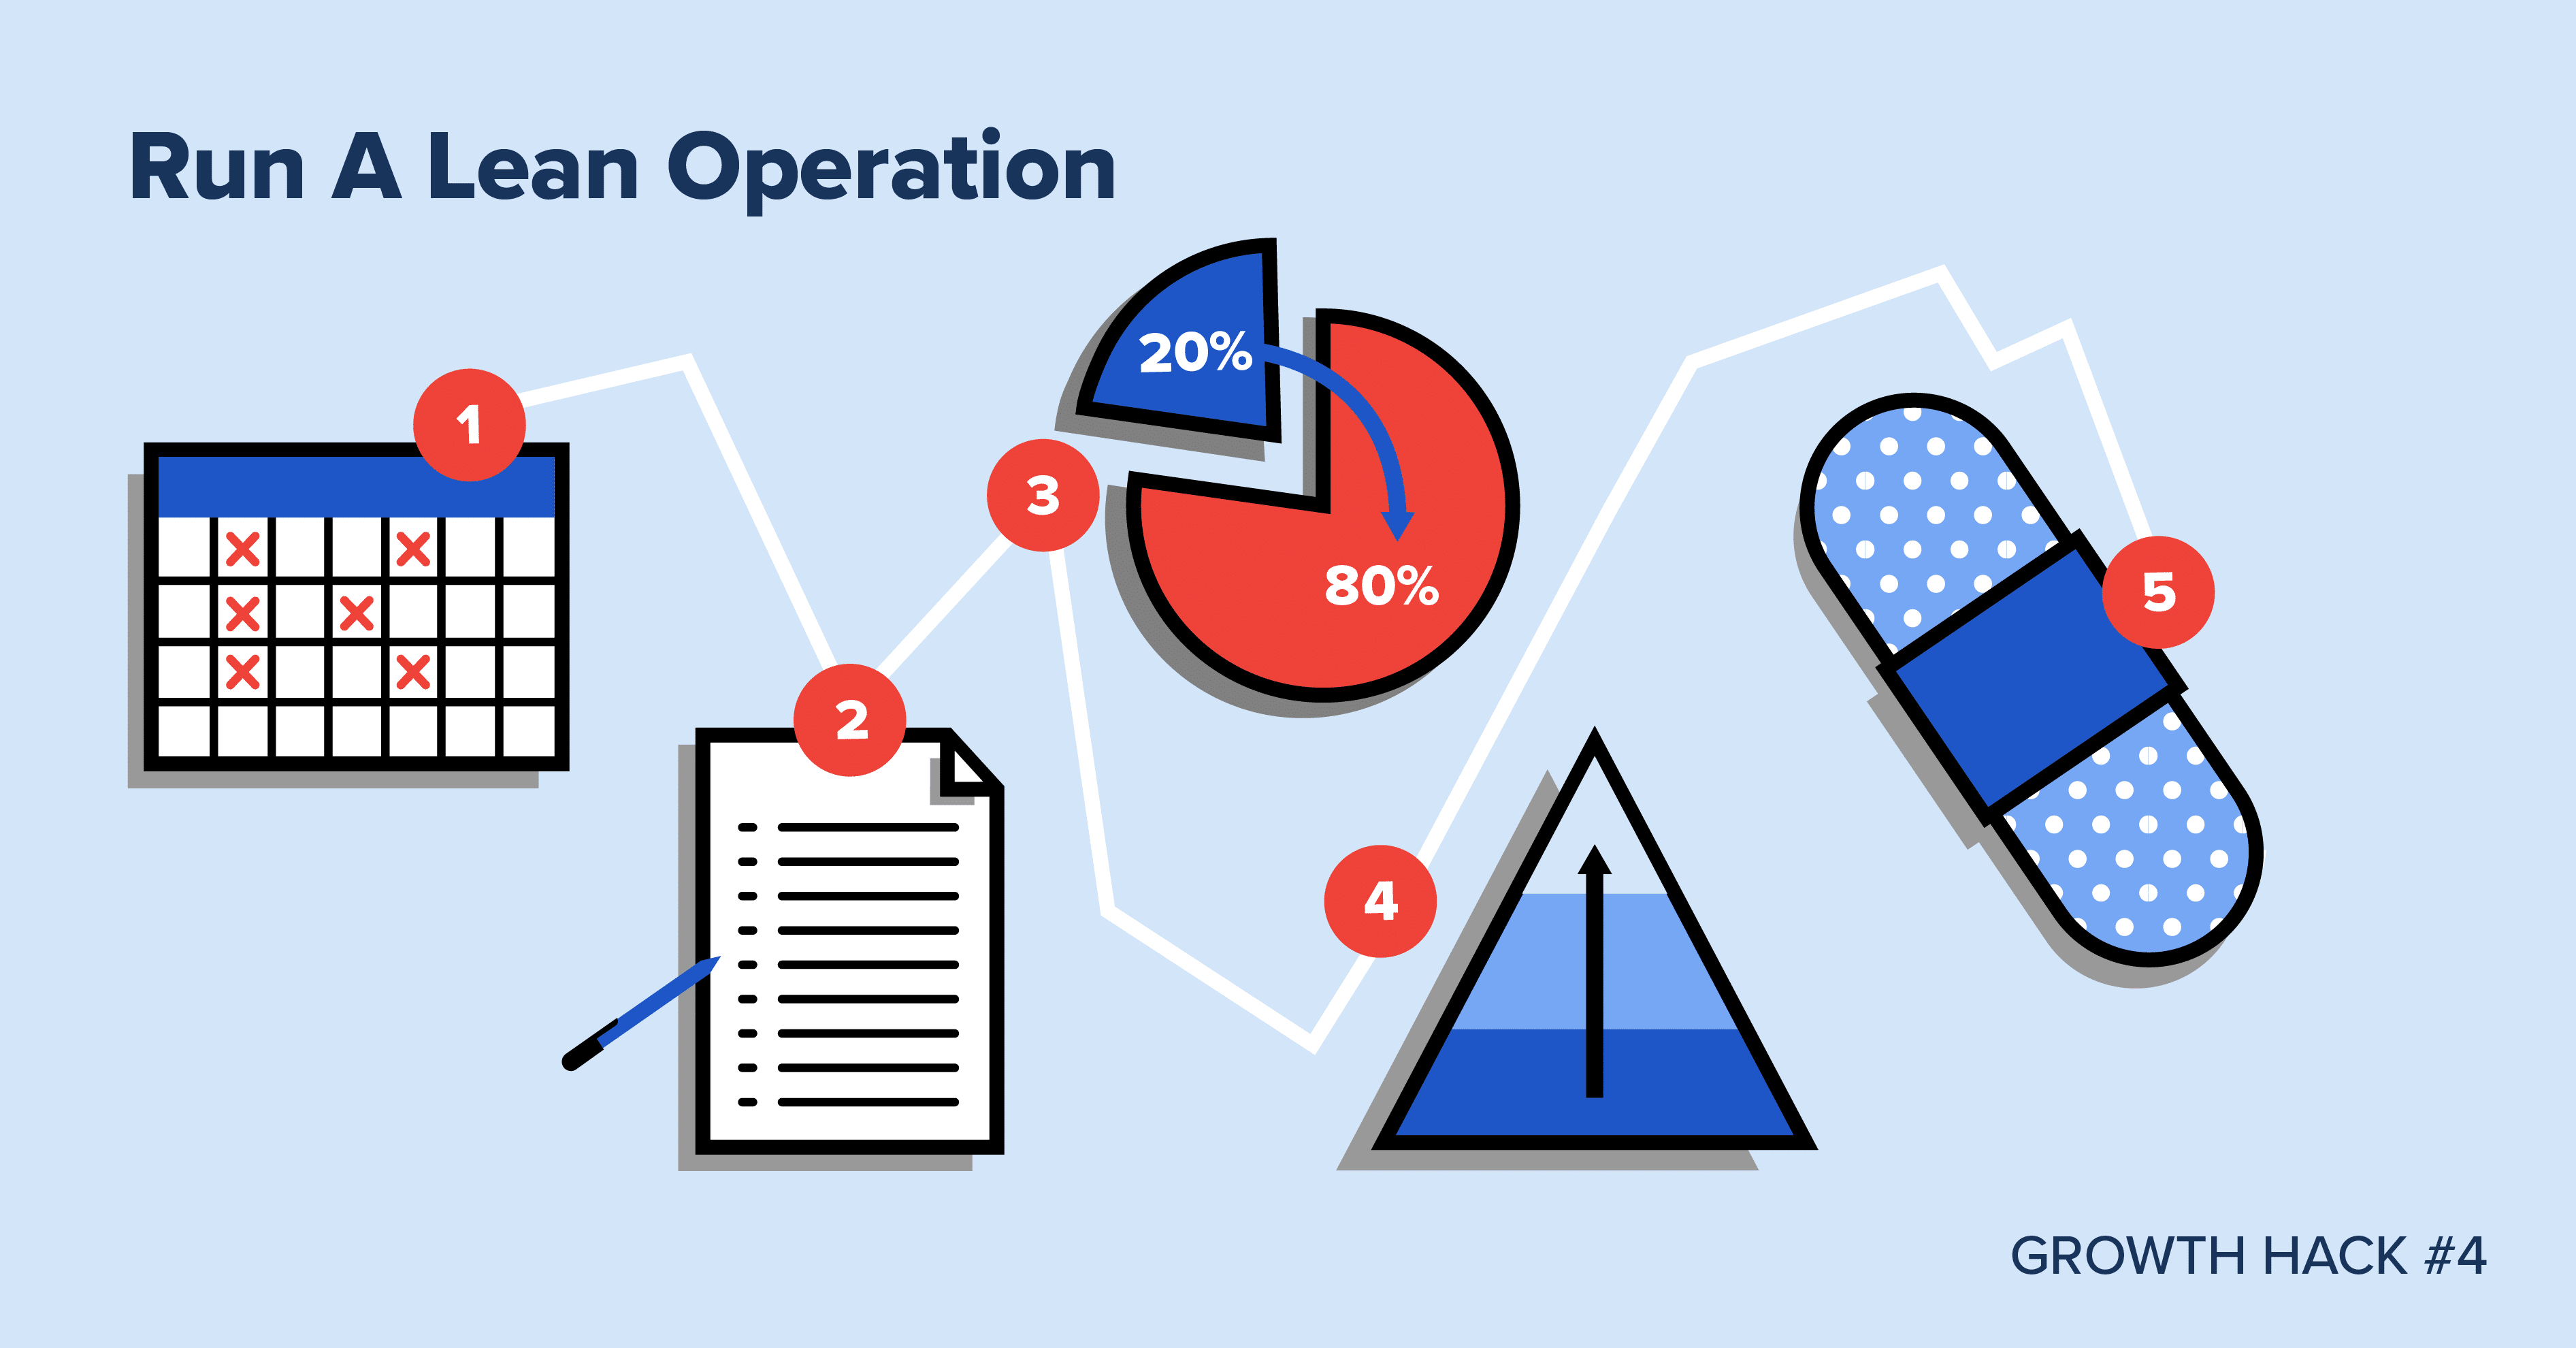 Growth Hack: Run a Lean Operation